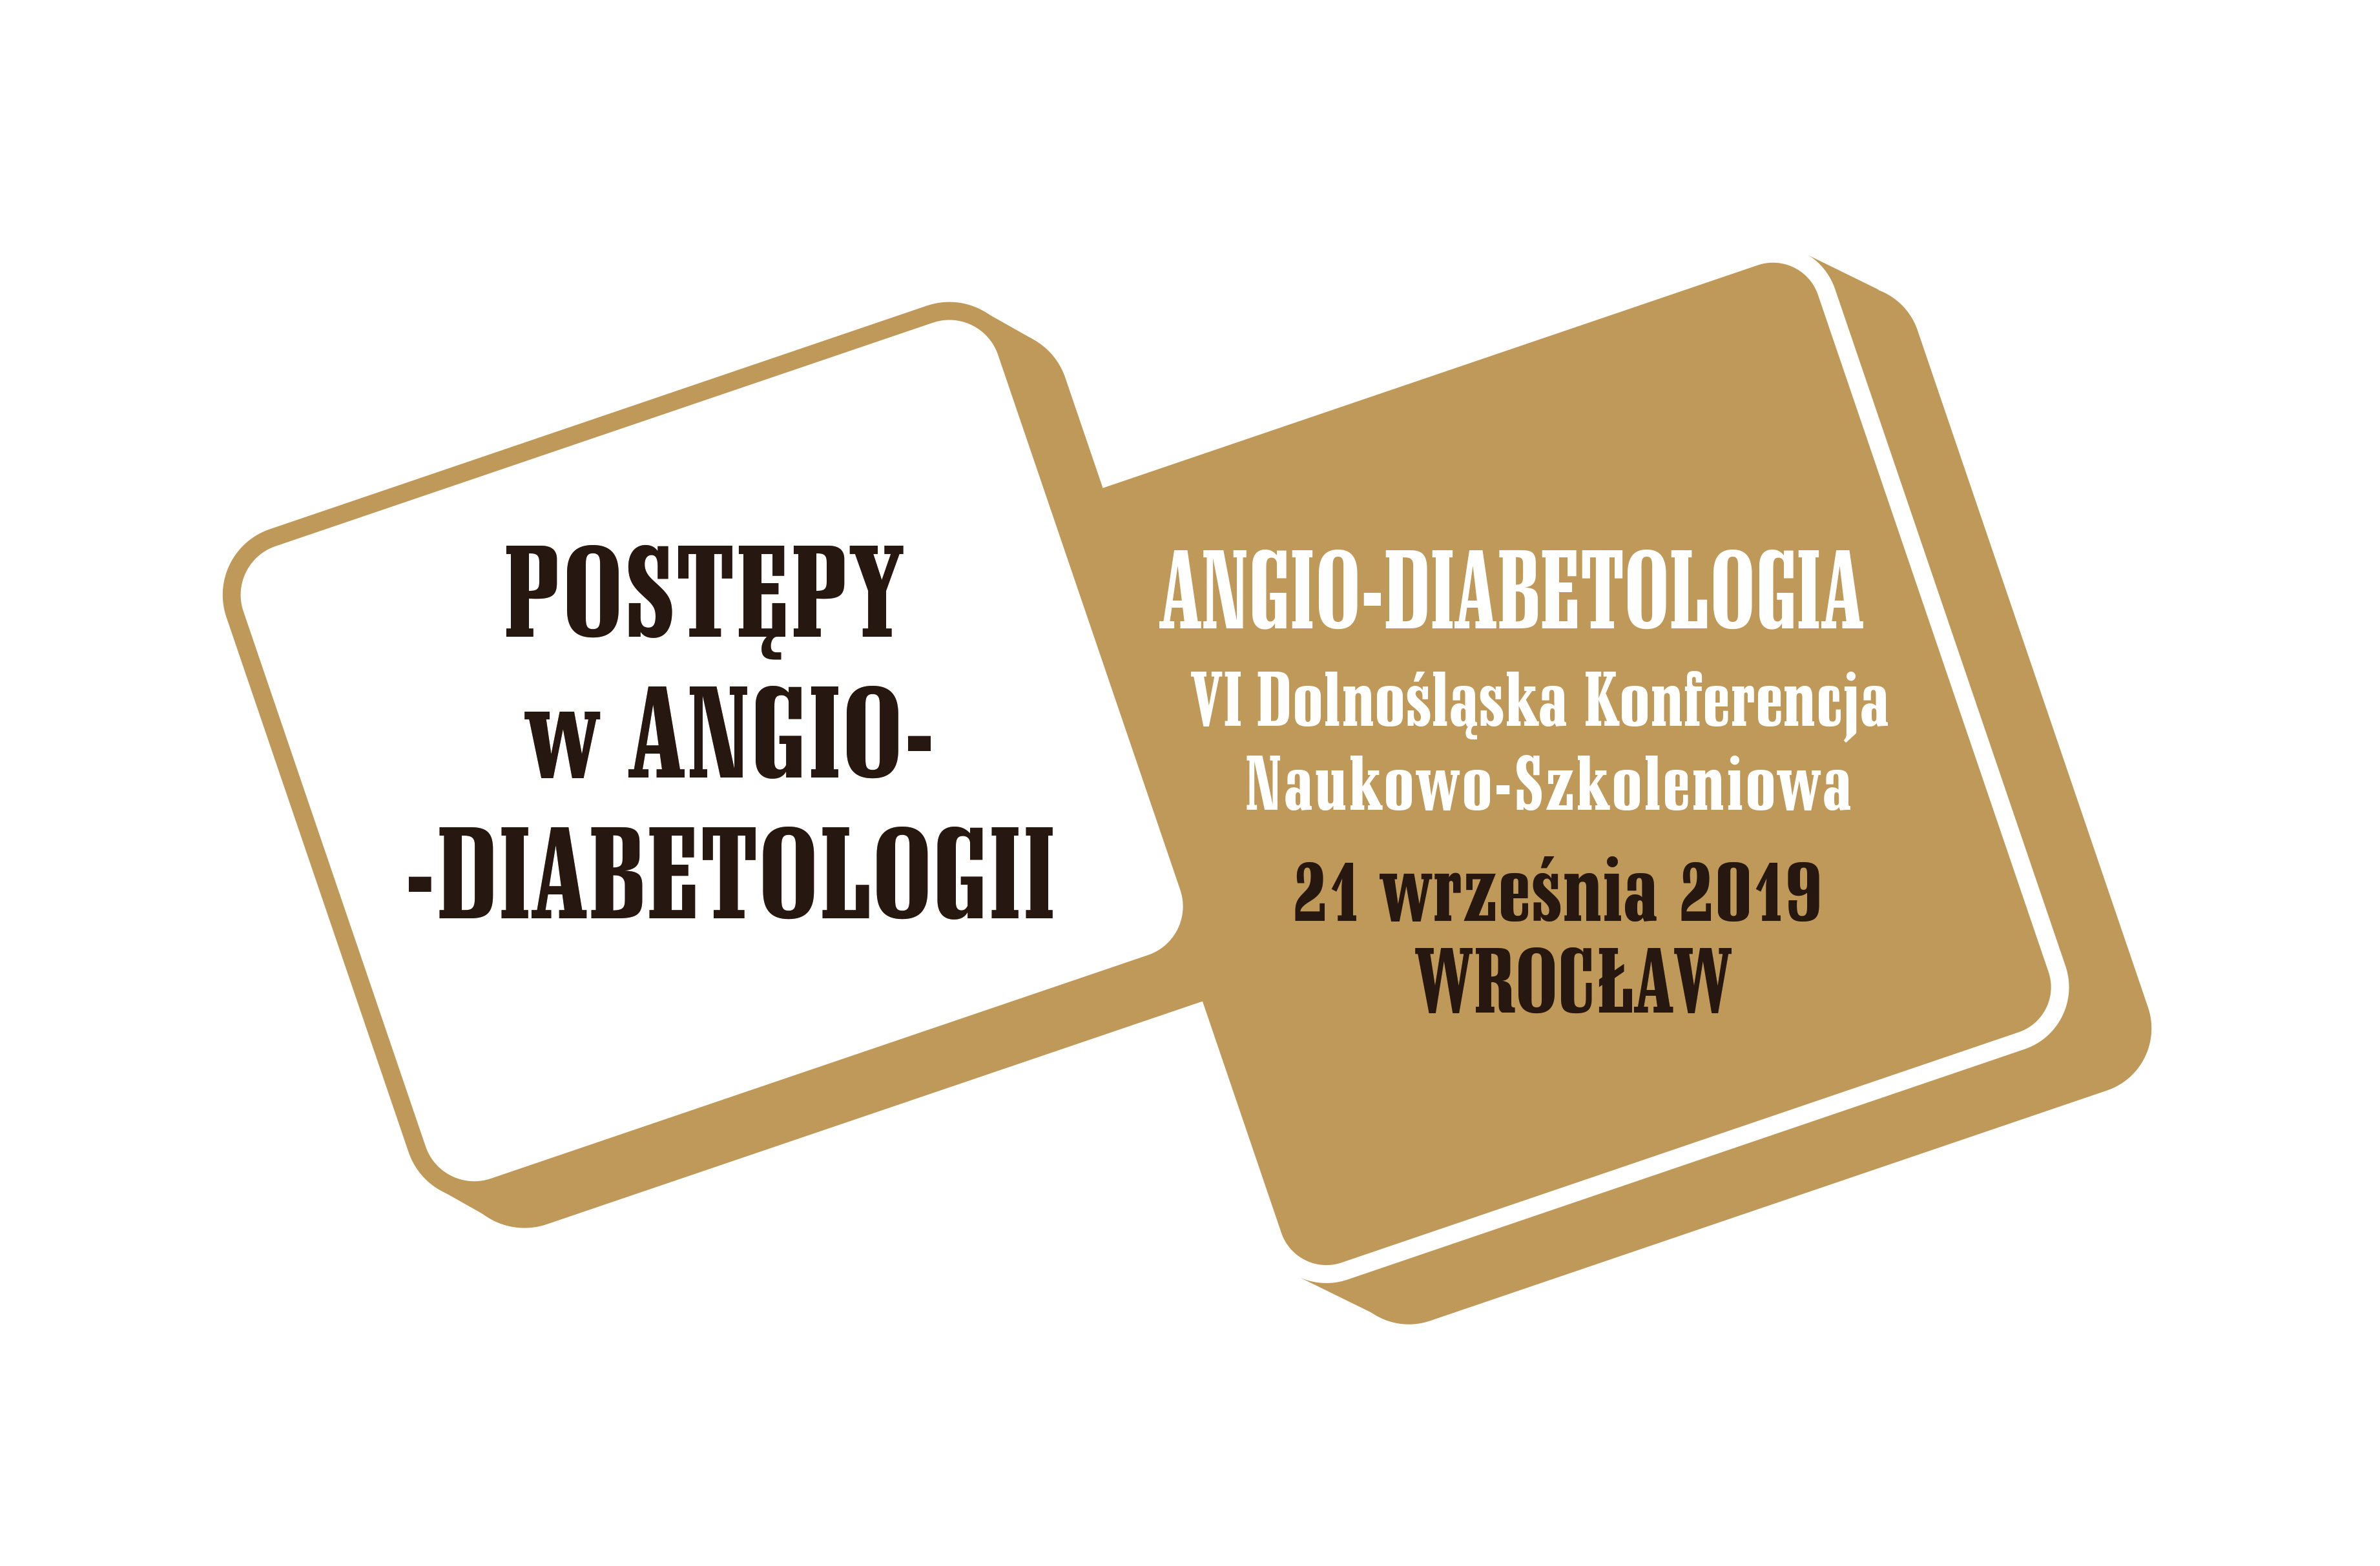 ANGIO-DIABETOLOGIA VI Dolnośląska Konferencja Naukowo-Szkoleniowa